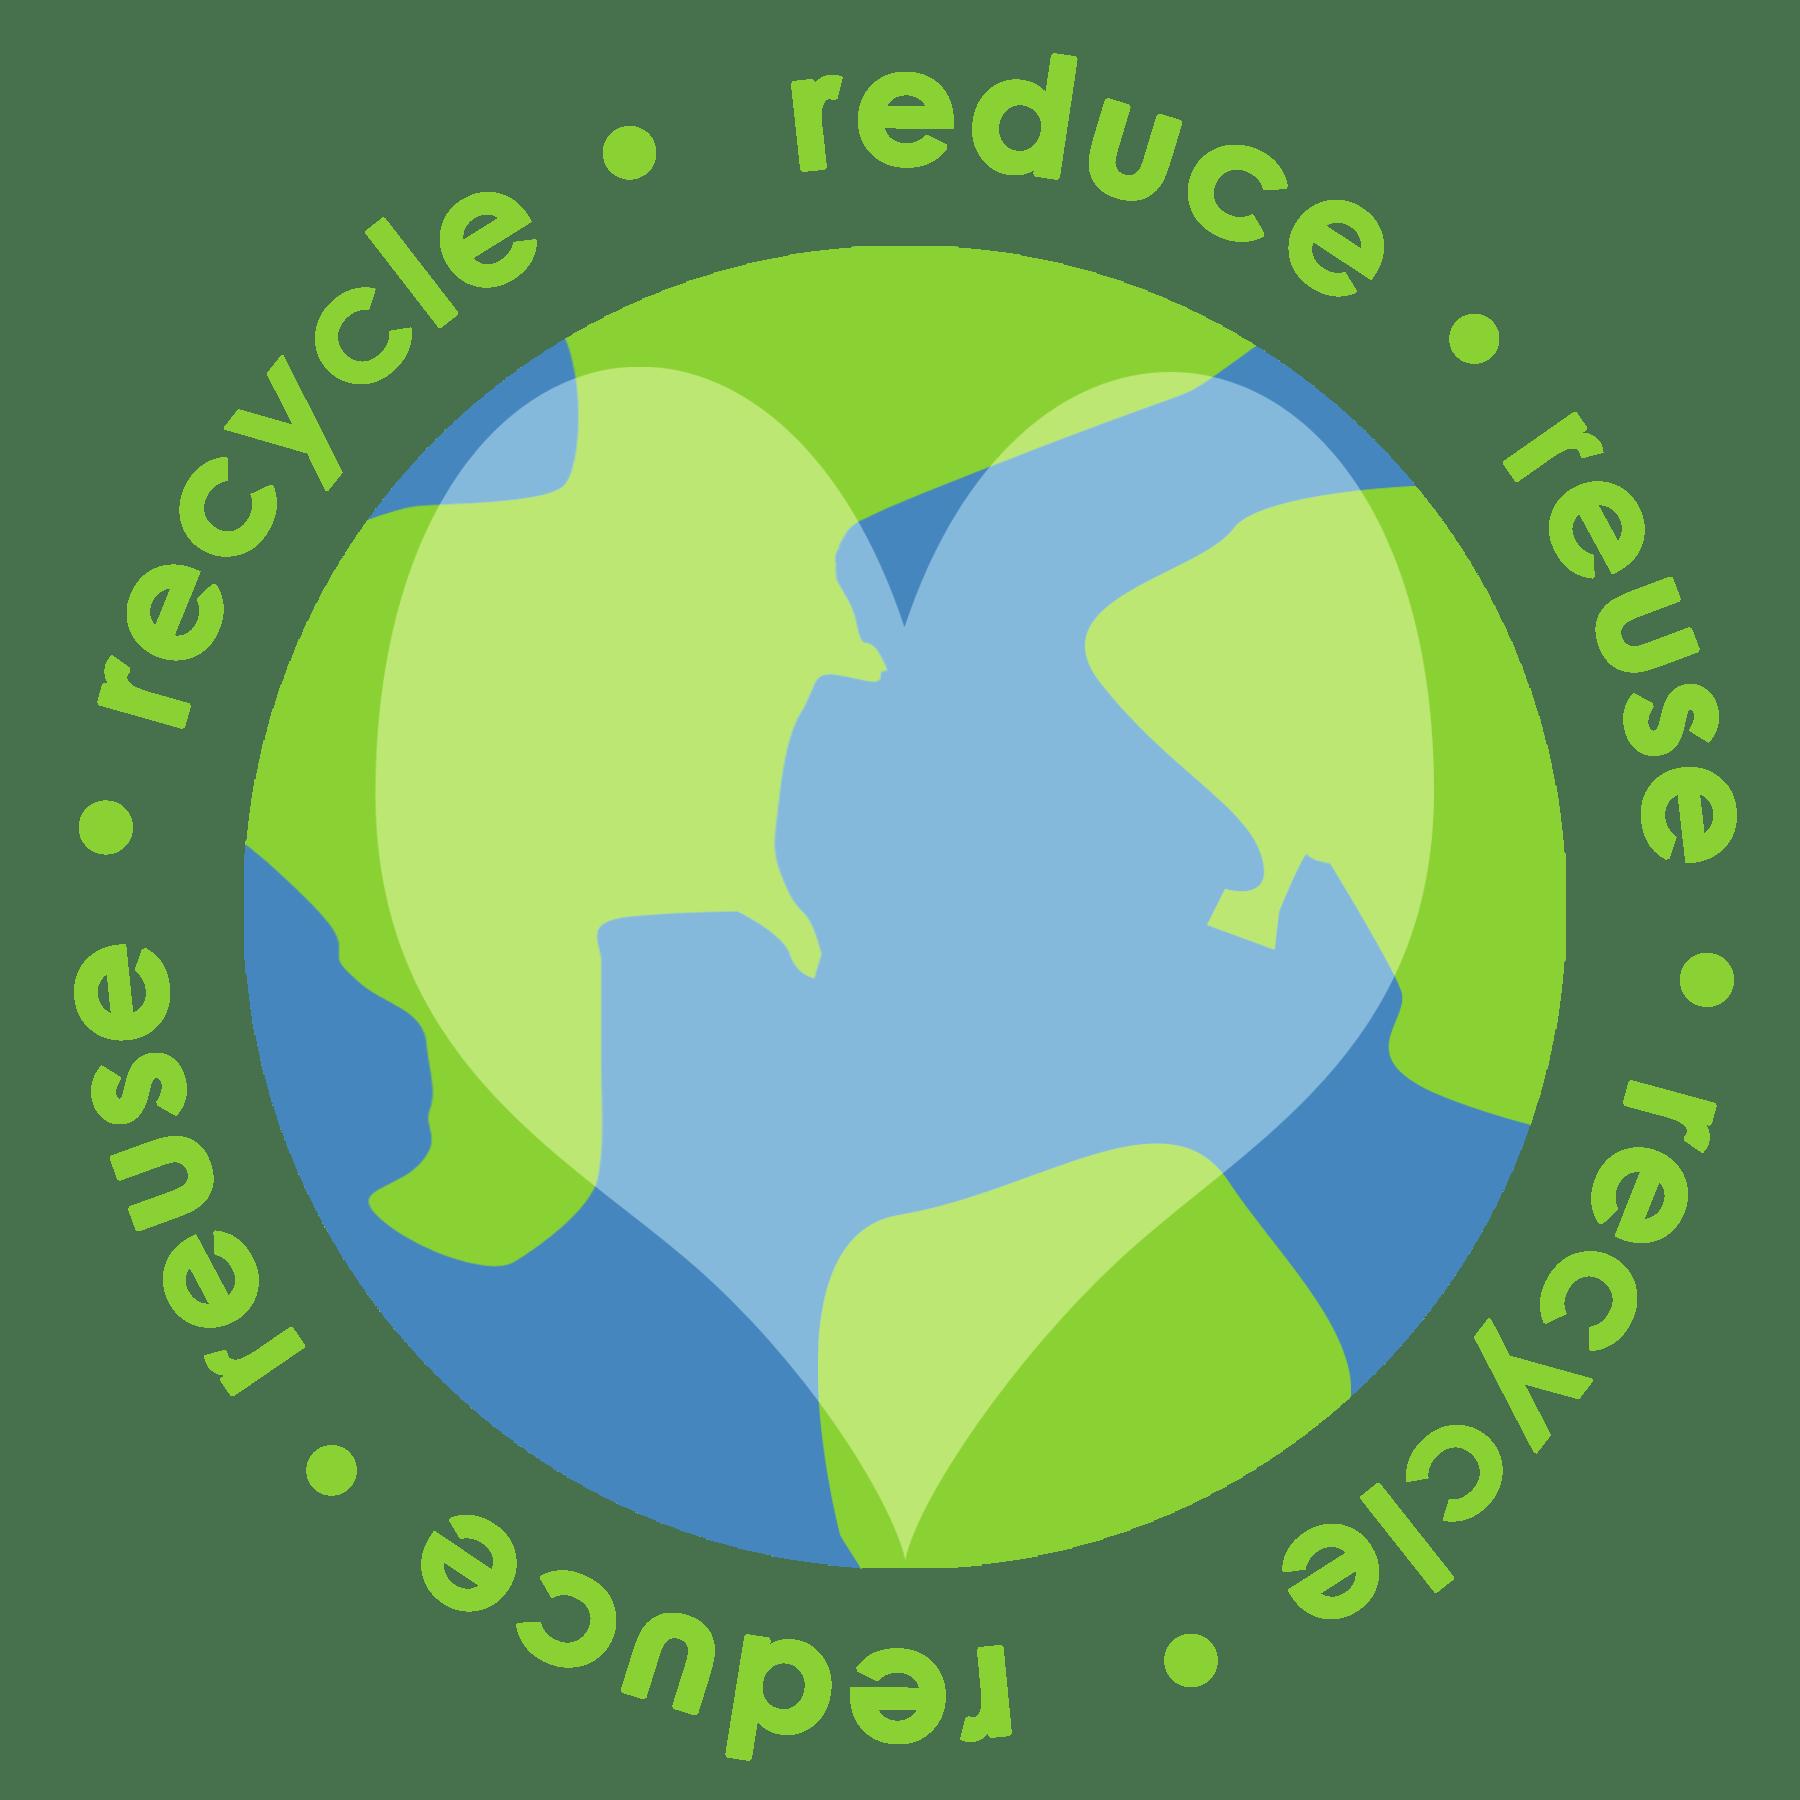 Reduce Reuse Recycle Transition Stourbridge